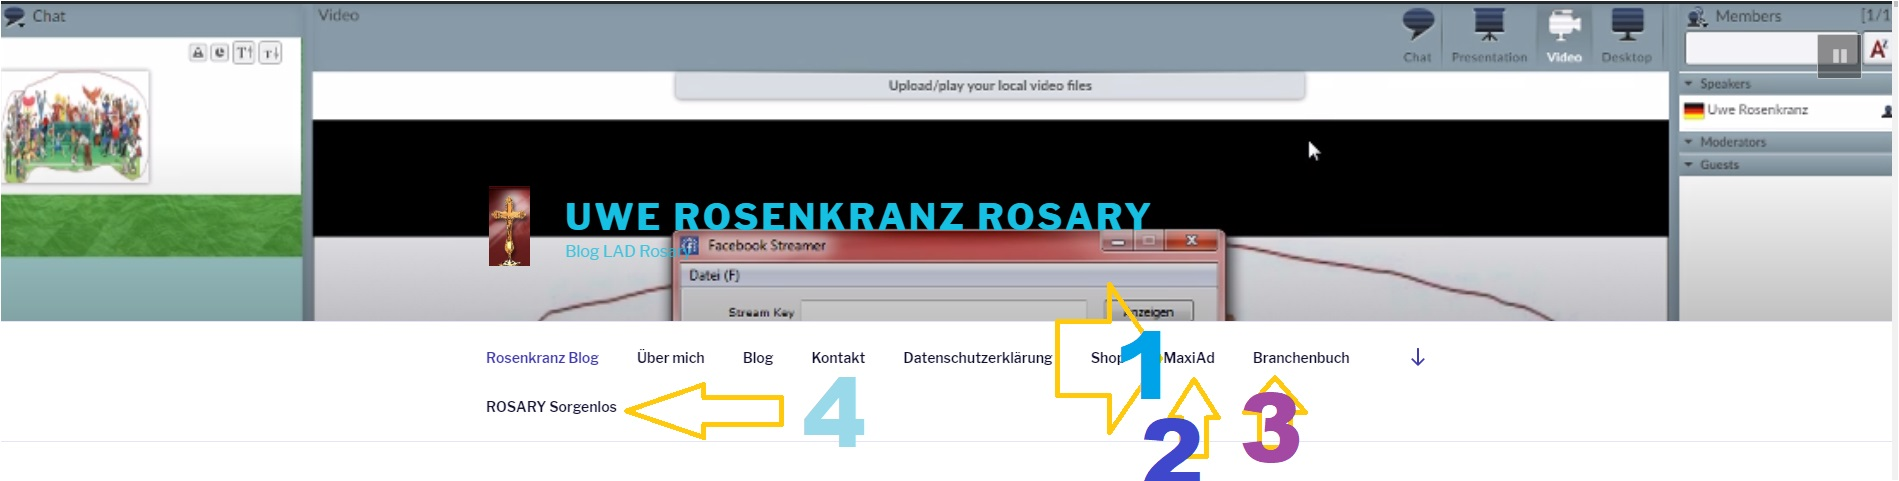 Rosenkranz